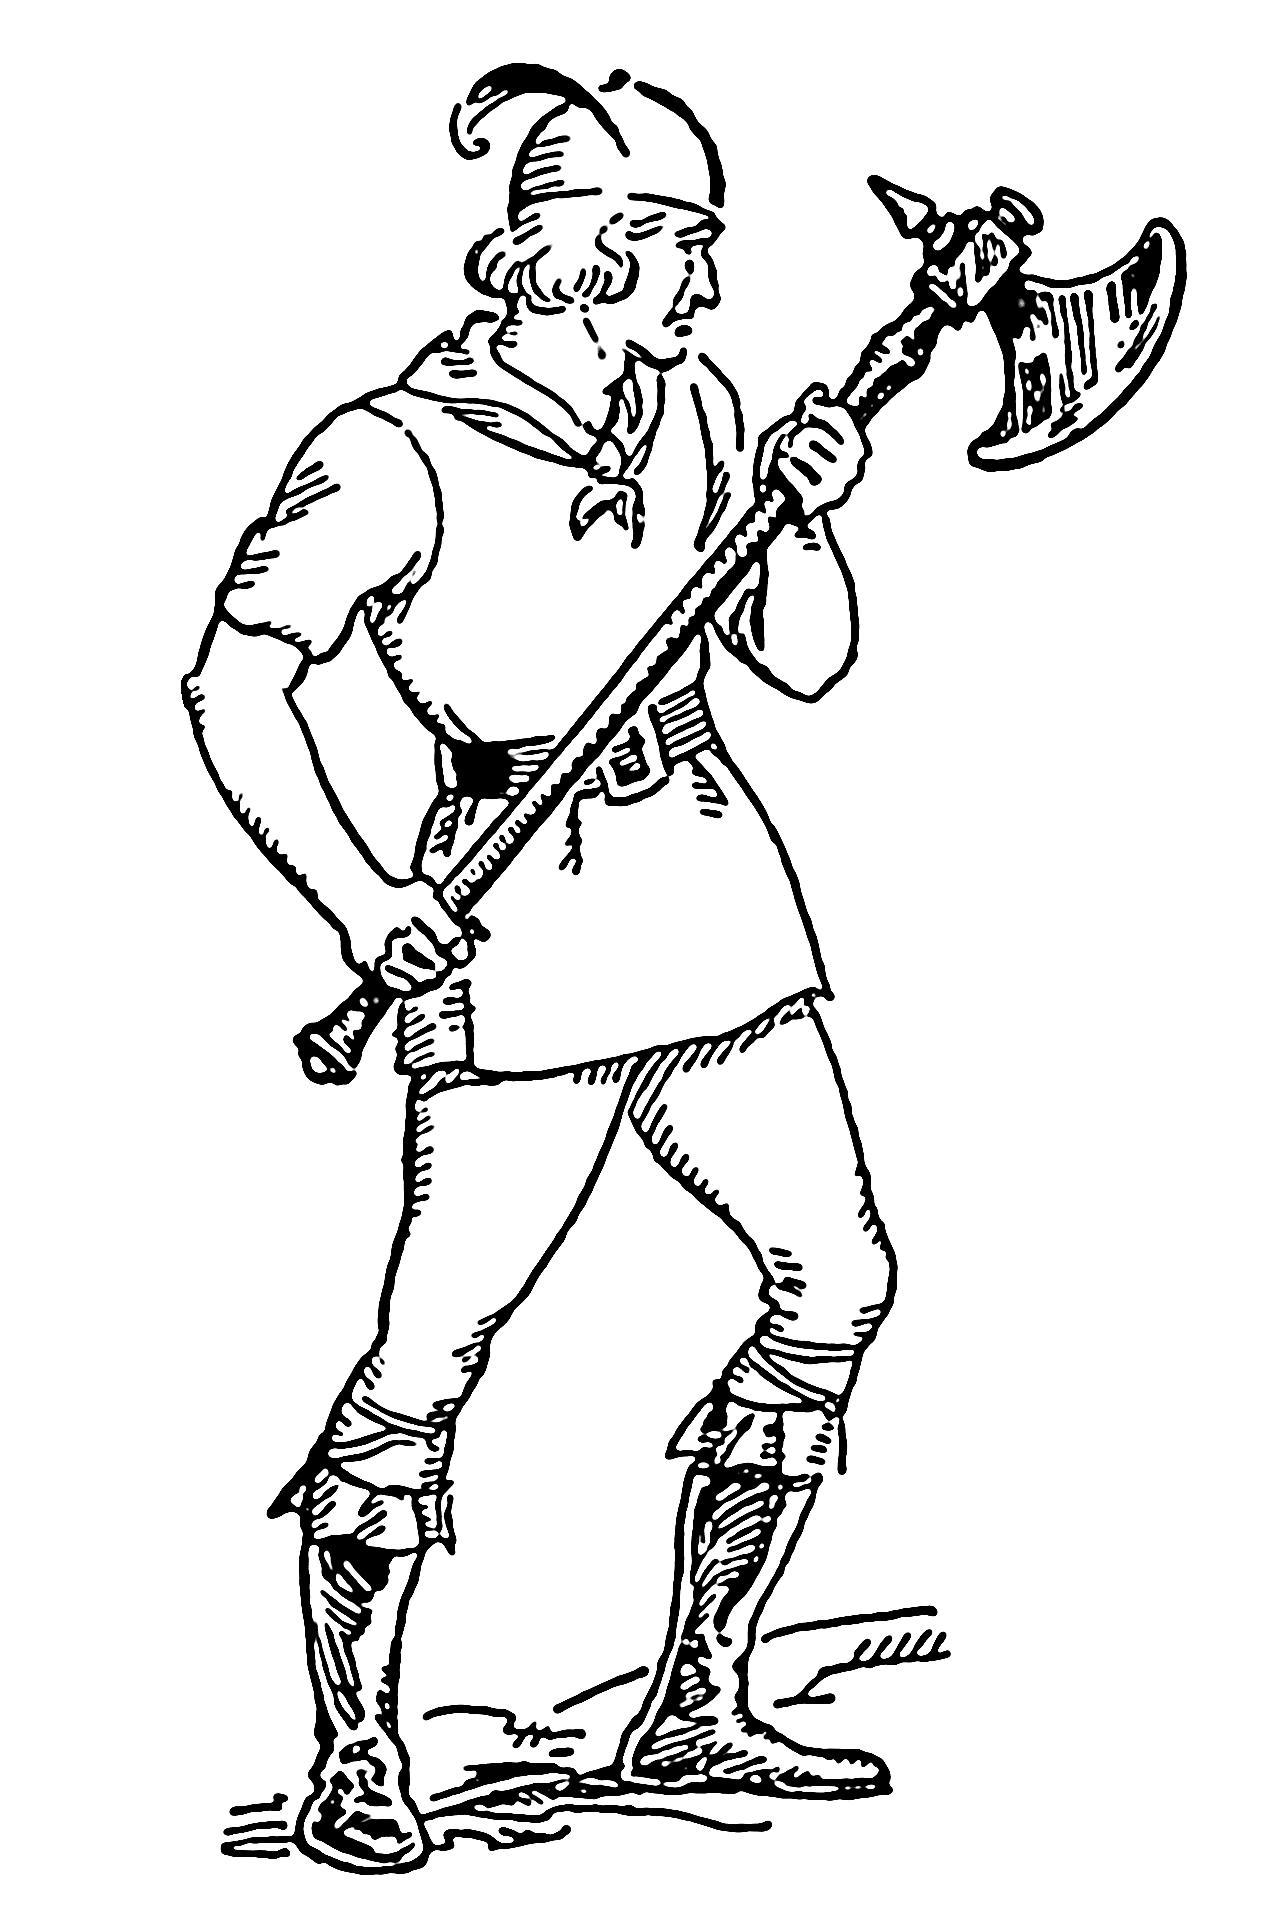 Battle Axe Drawing File:battle Axe 001.png